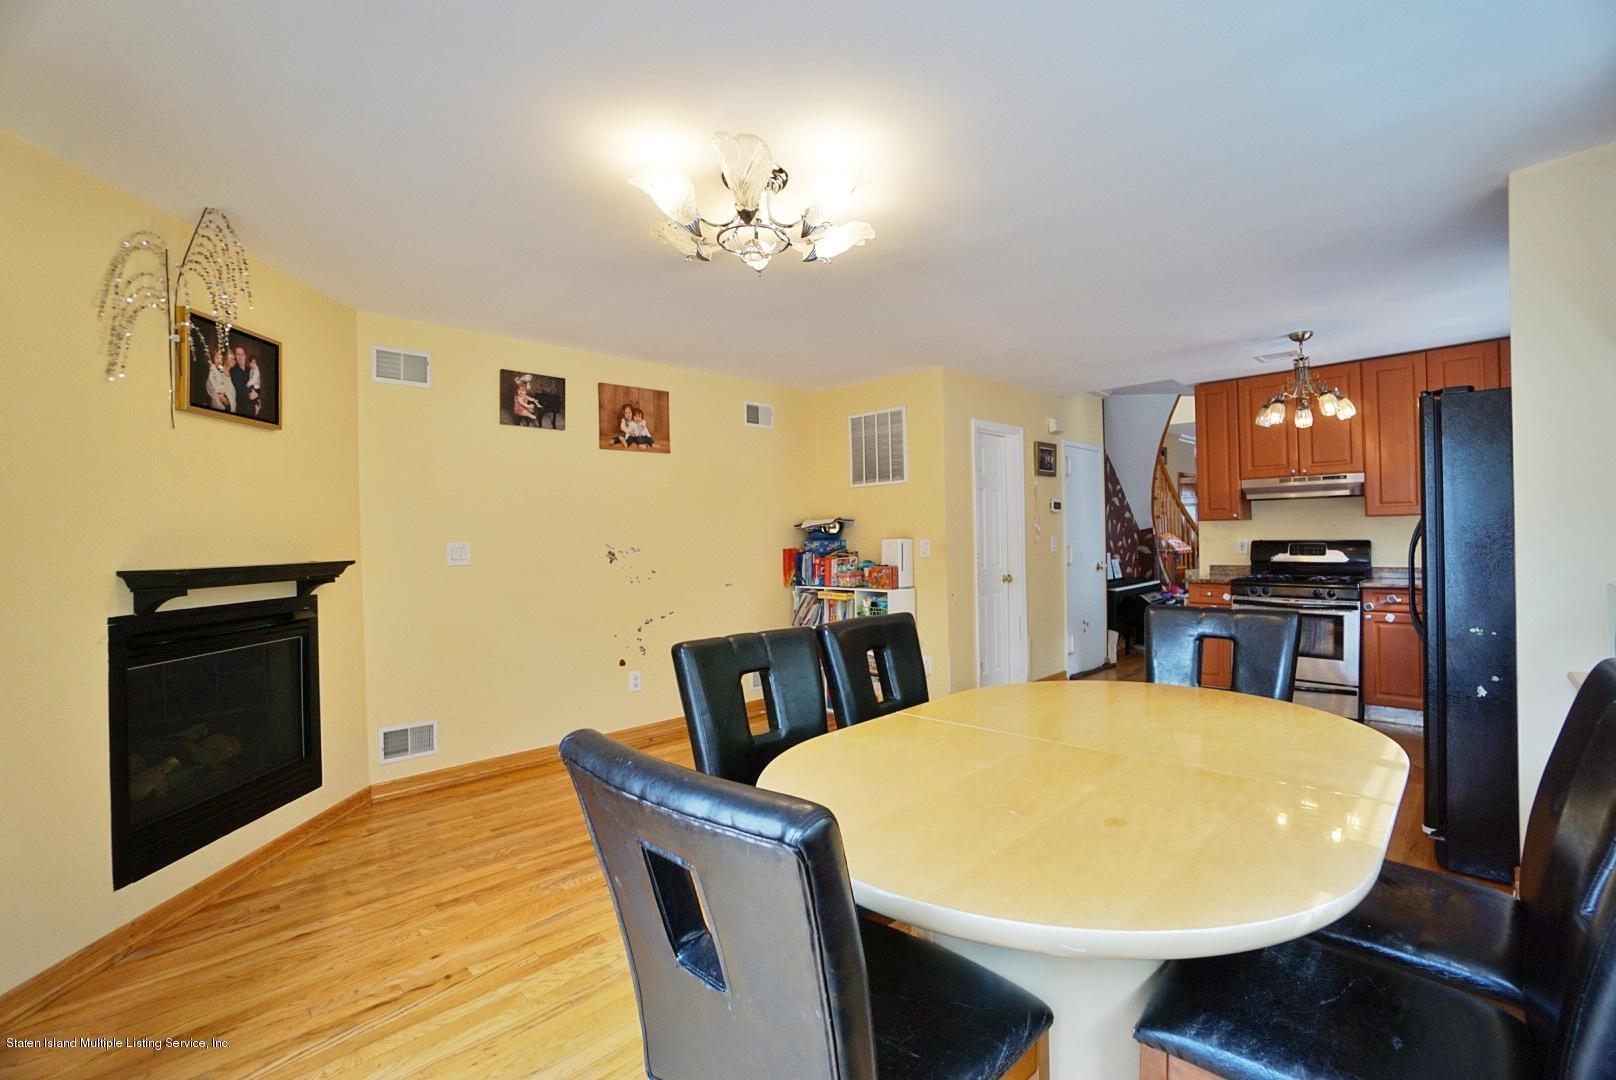 Single Family - Semi-Attached 36 Zwicky Avenue  Staten Island, NY 10306, MLS-1131911-8